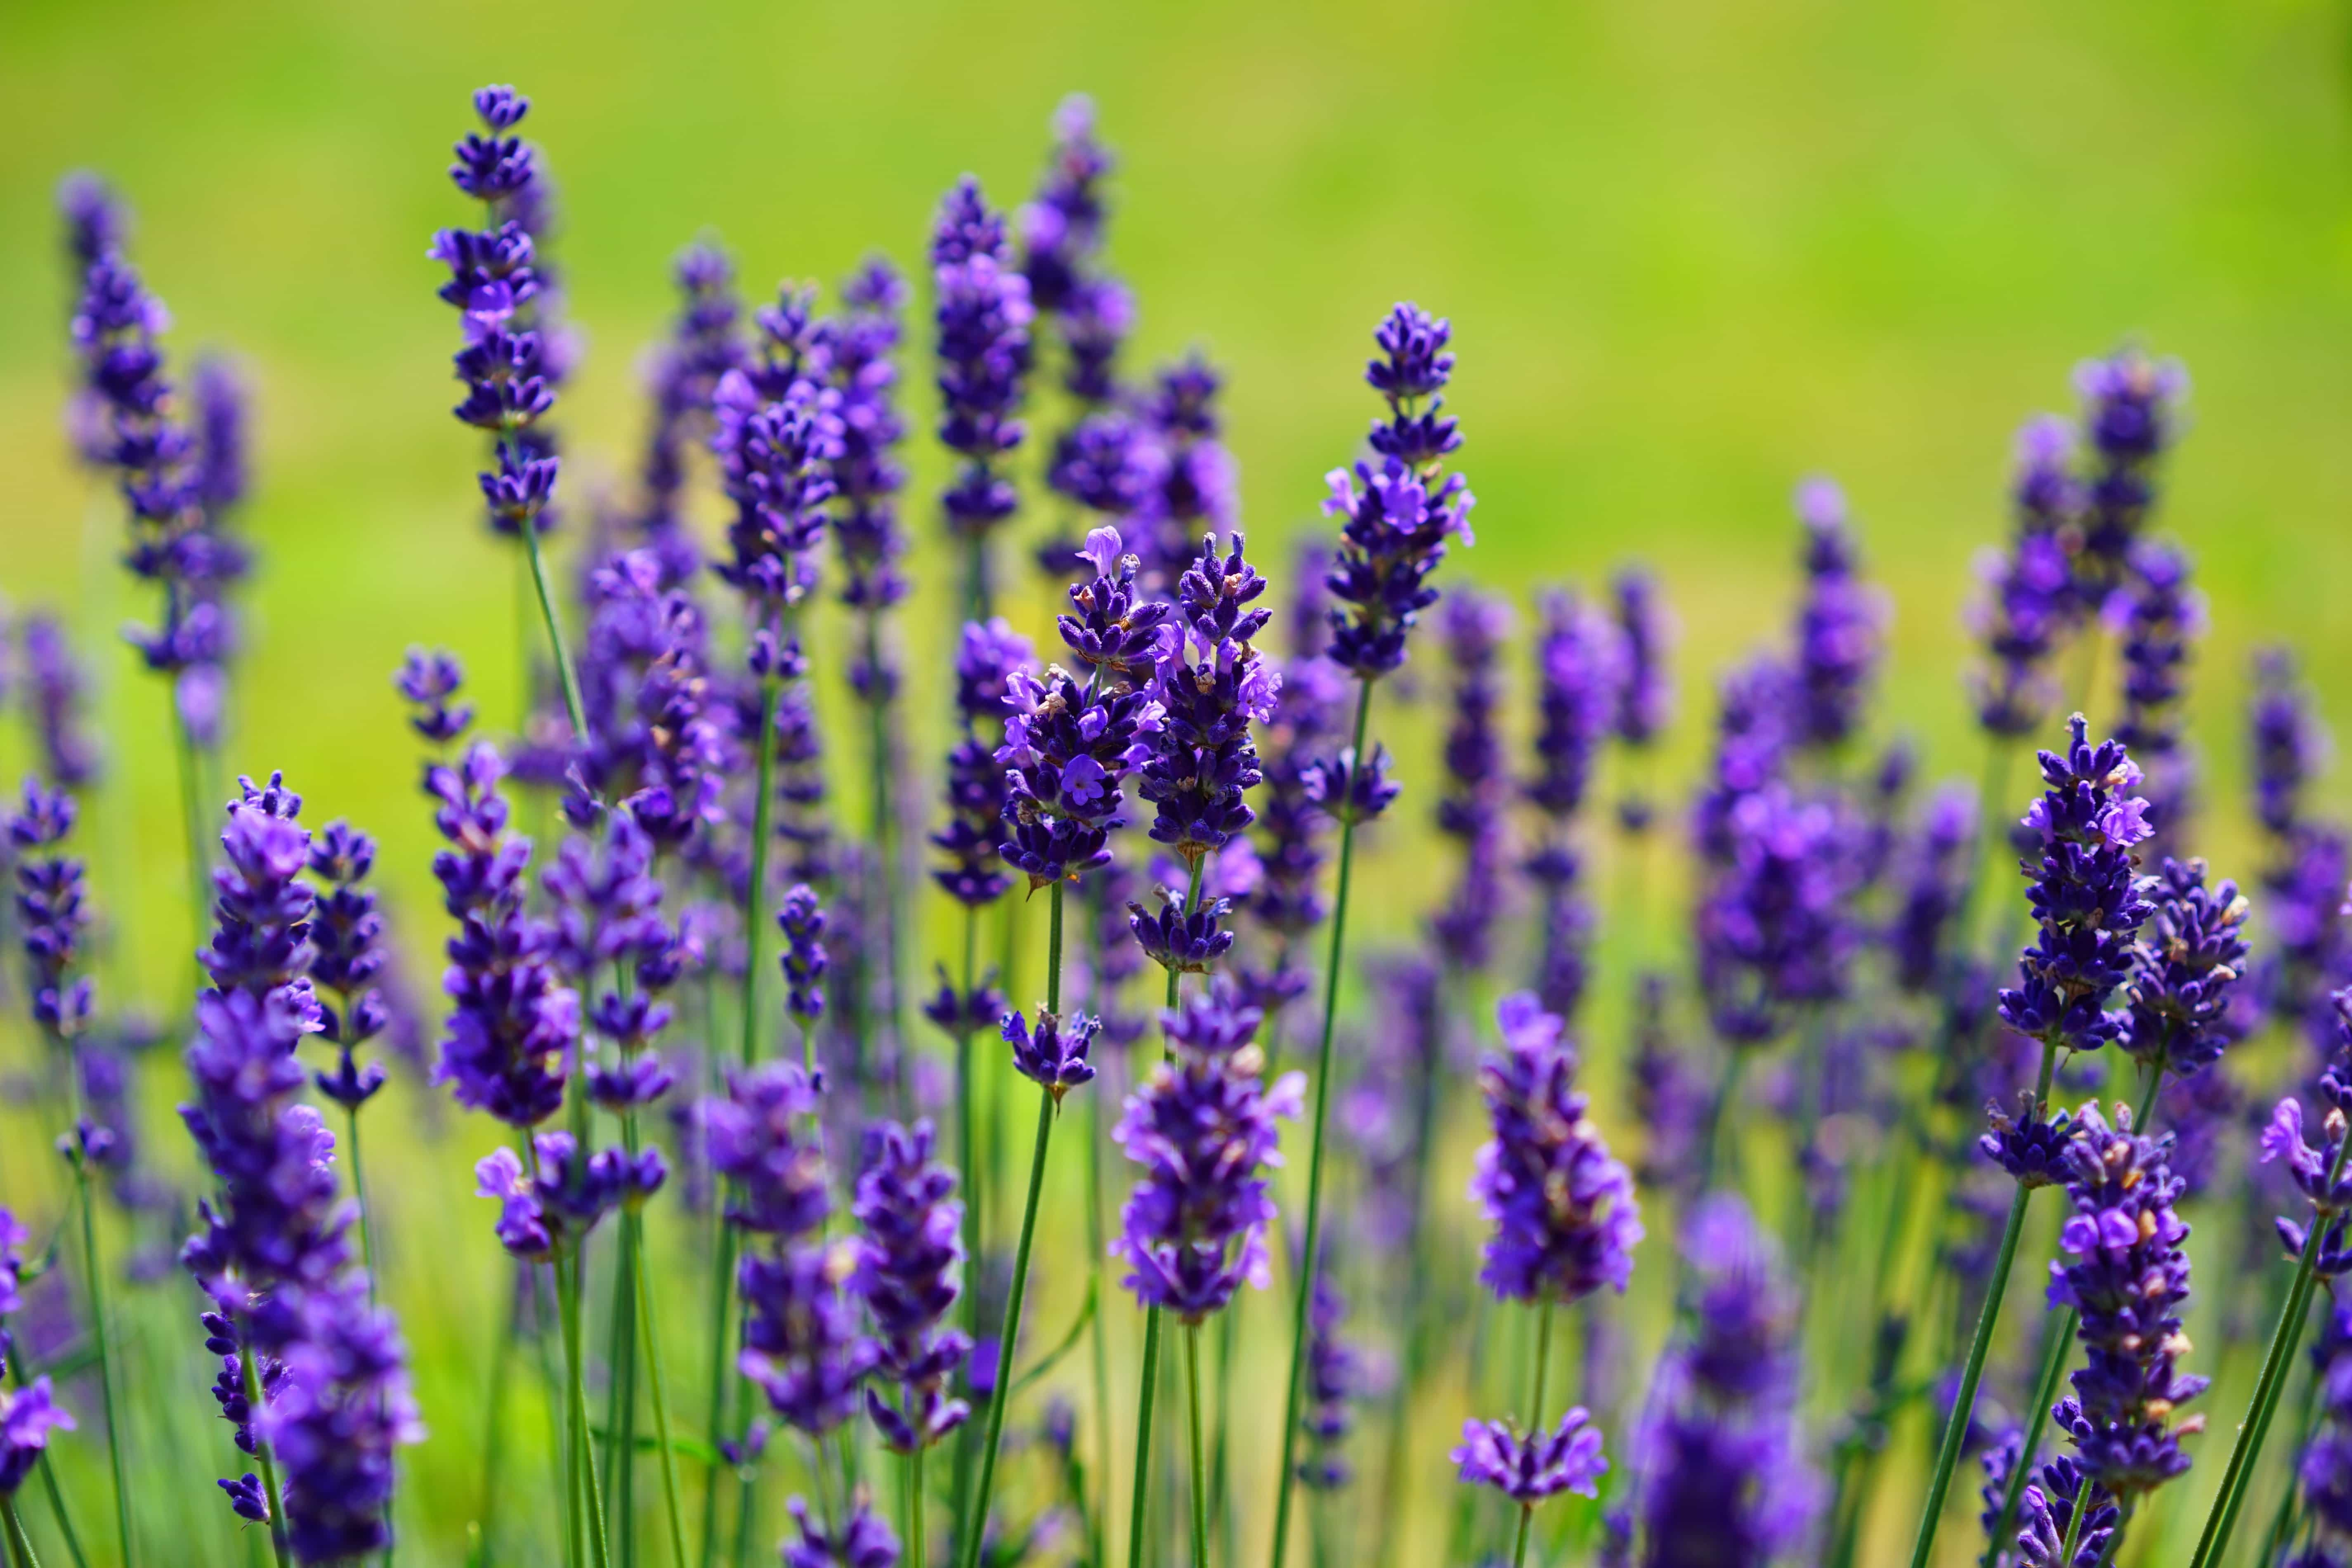 image libre parfum fleur champ nature flore lavande plante jardin. Black Bedroom Furniture Sets. Home Design Ideas